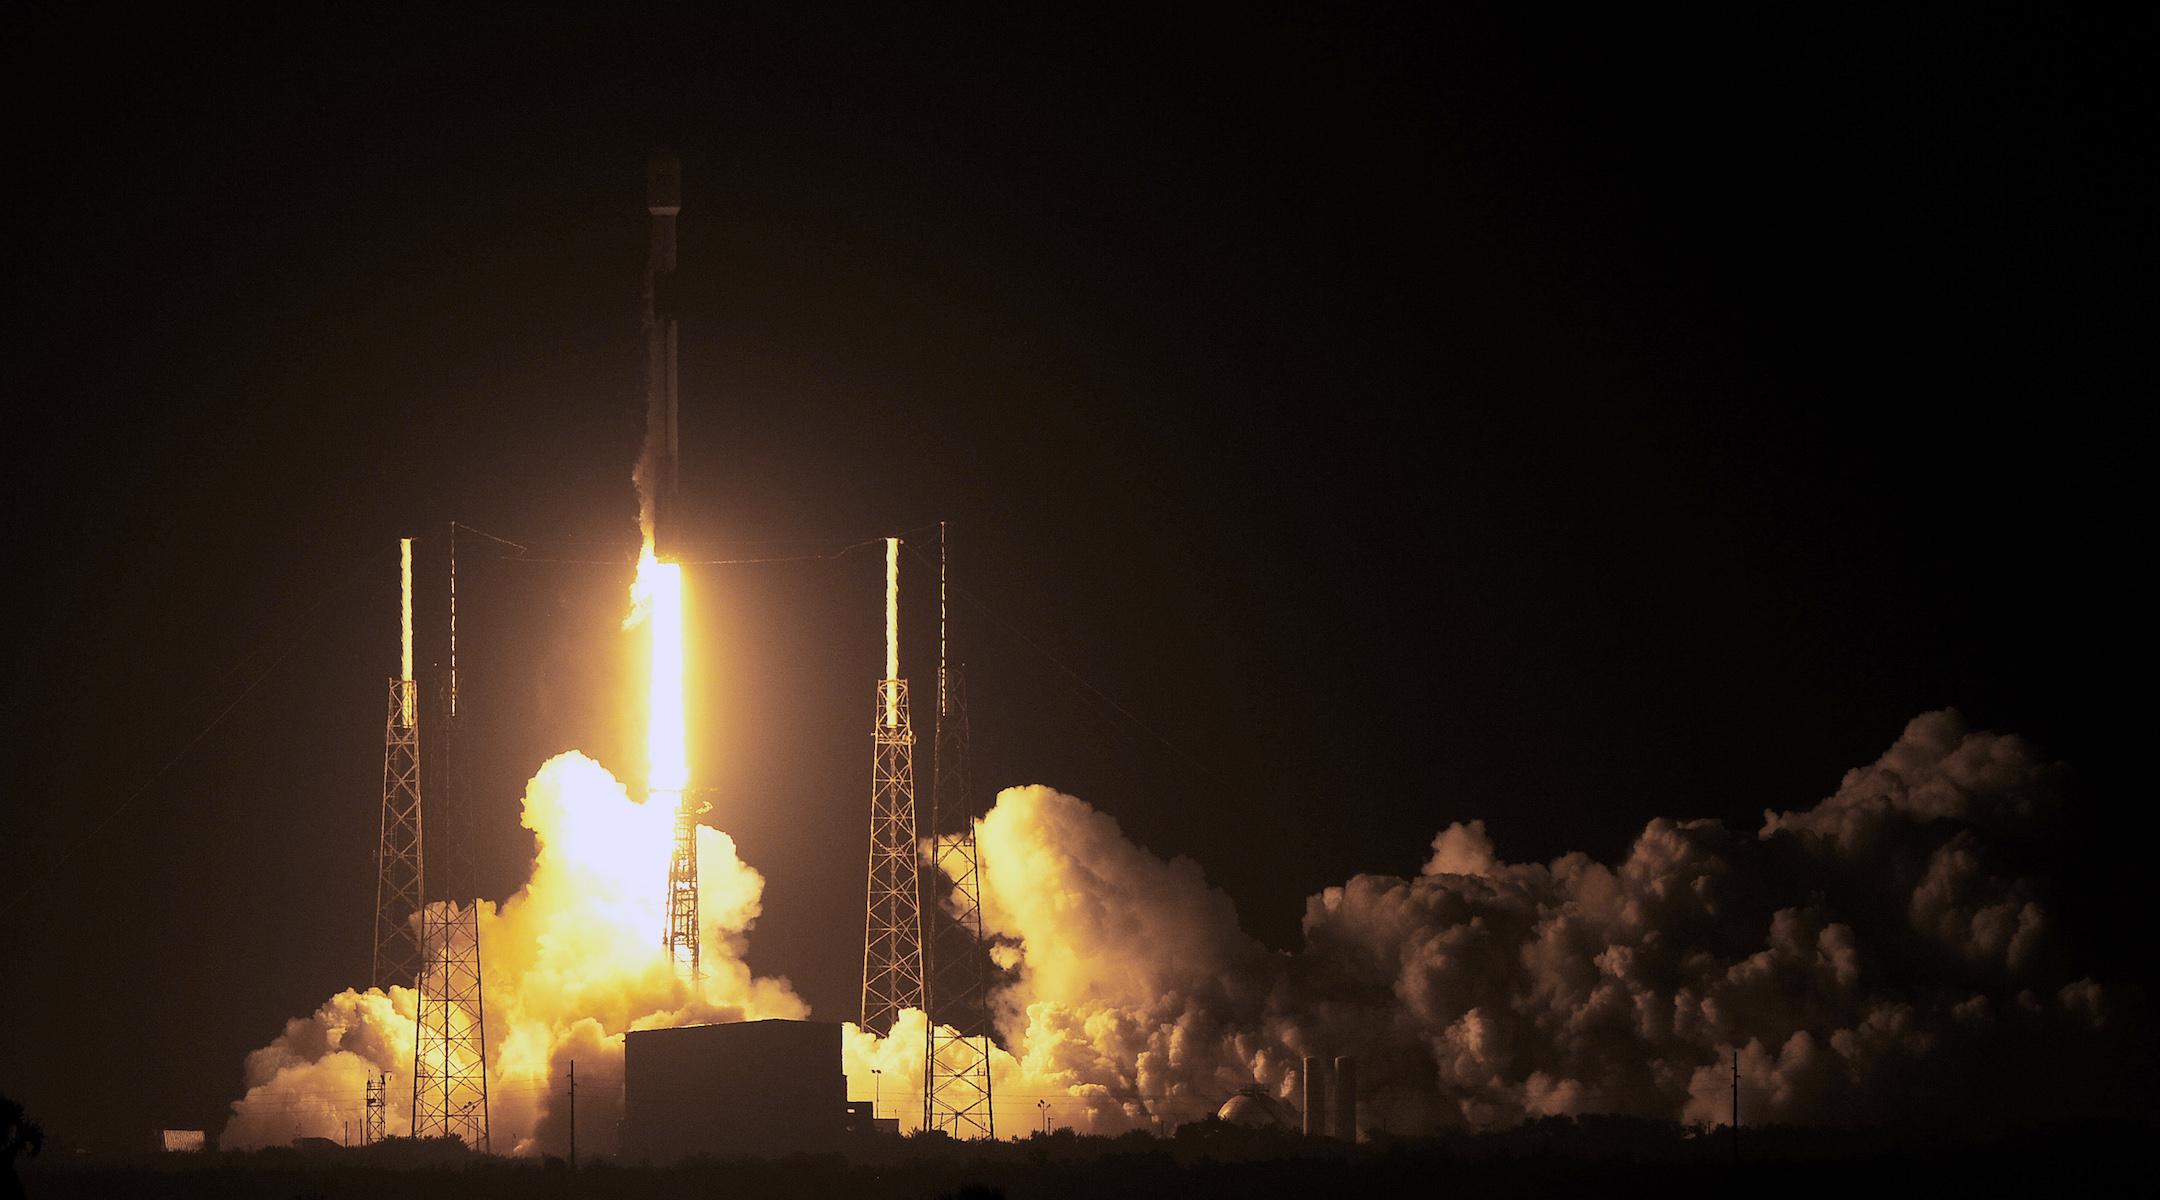 Israel moon lander